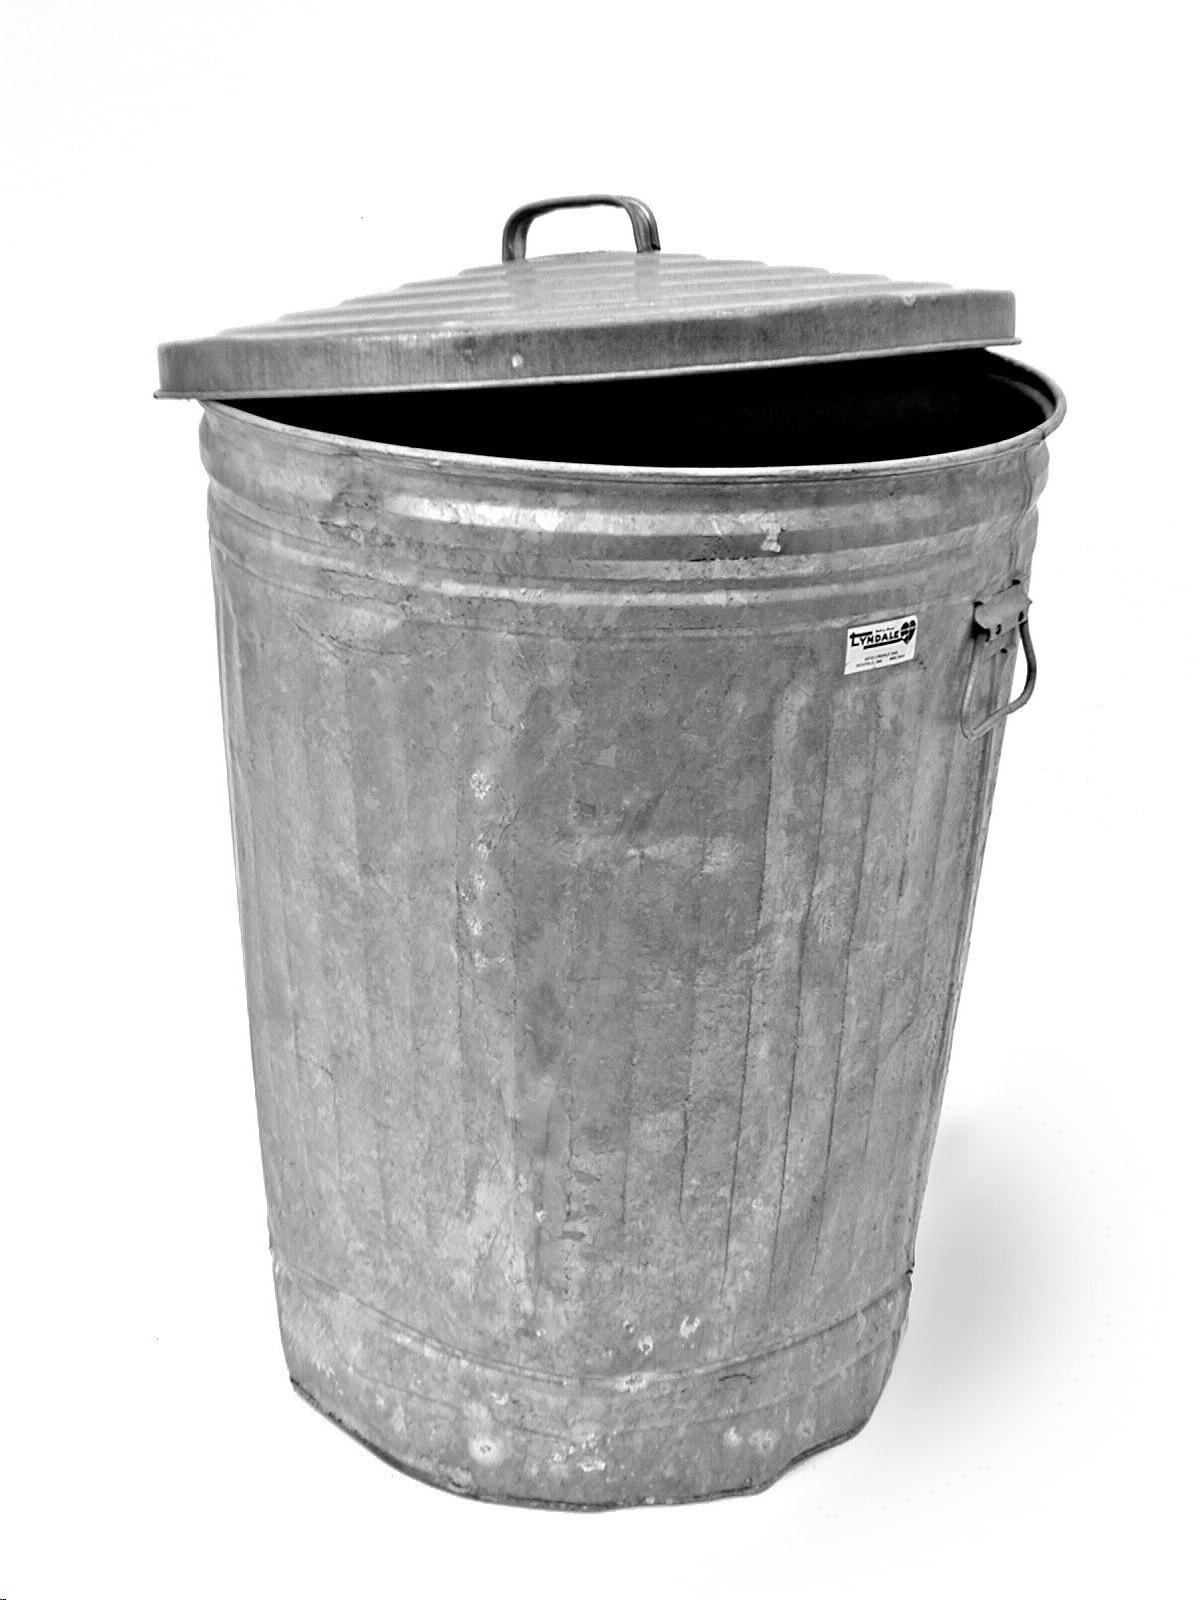 image tong sampah